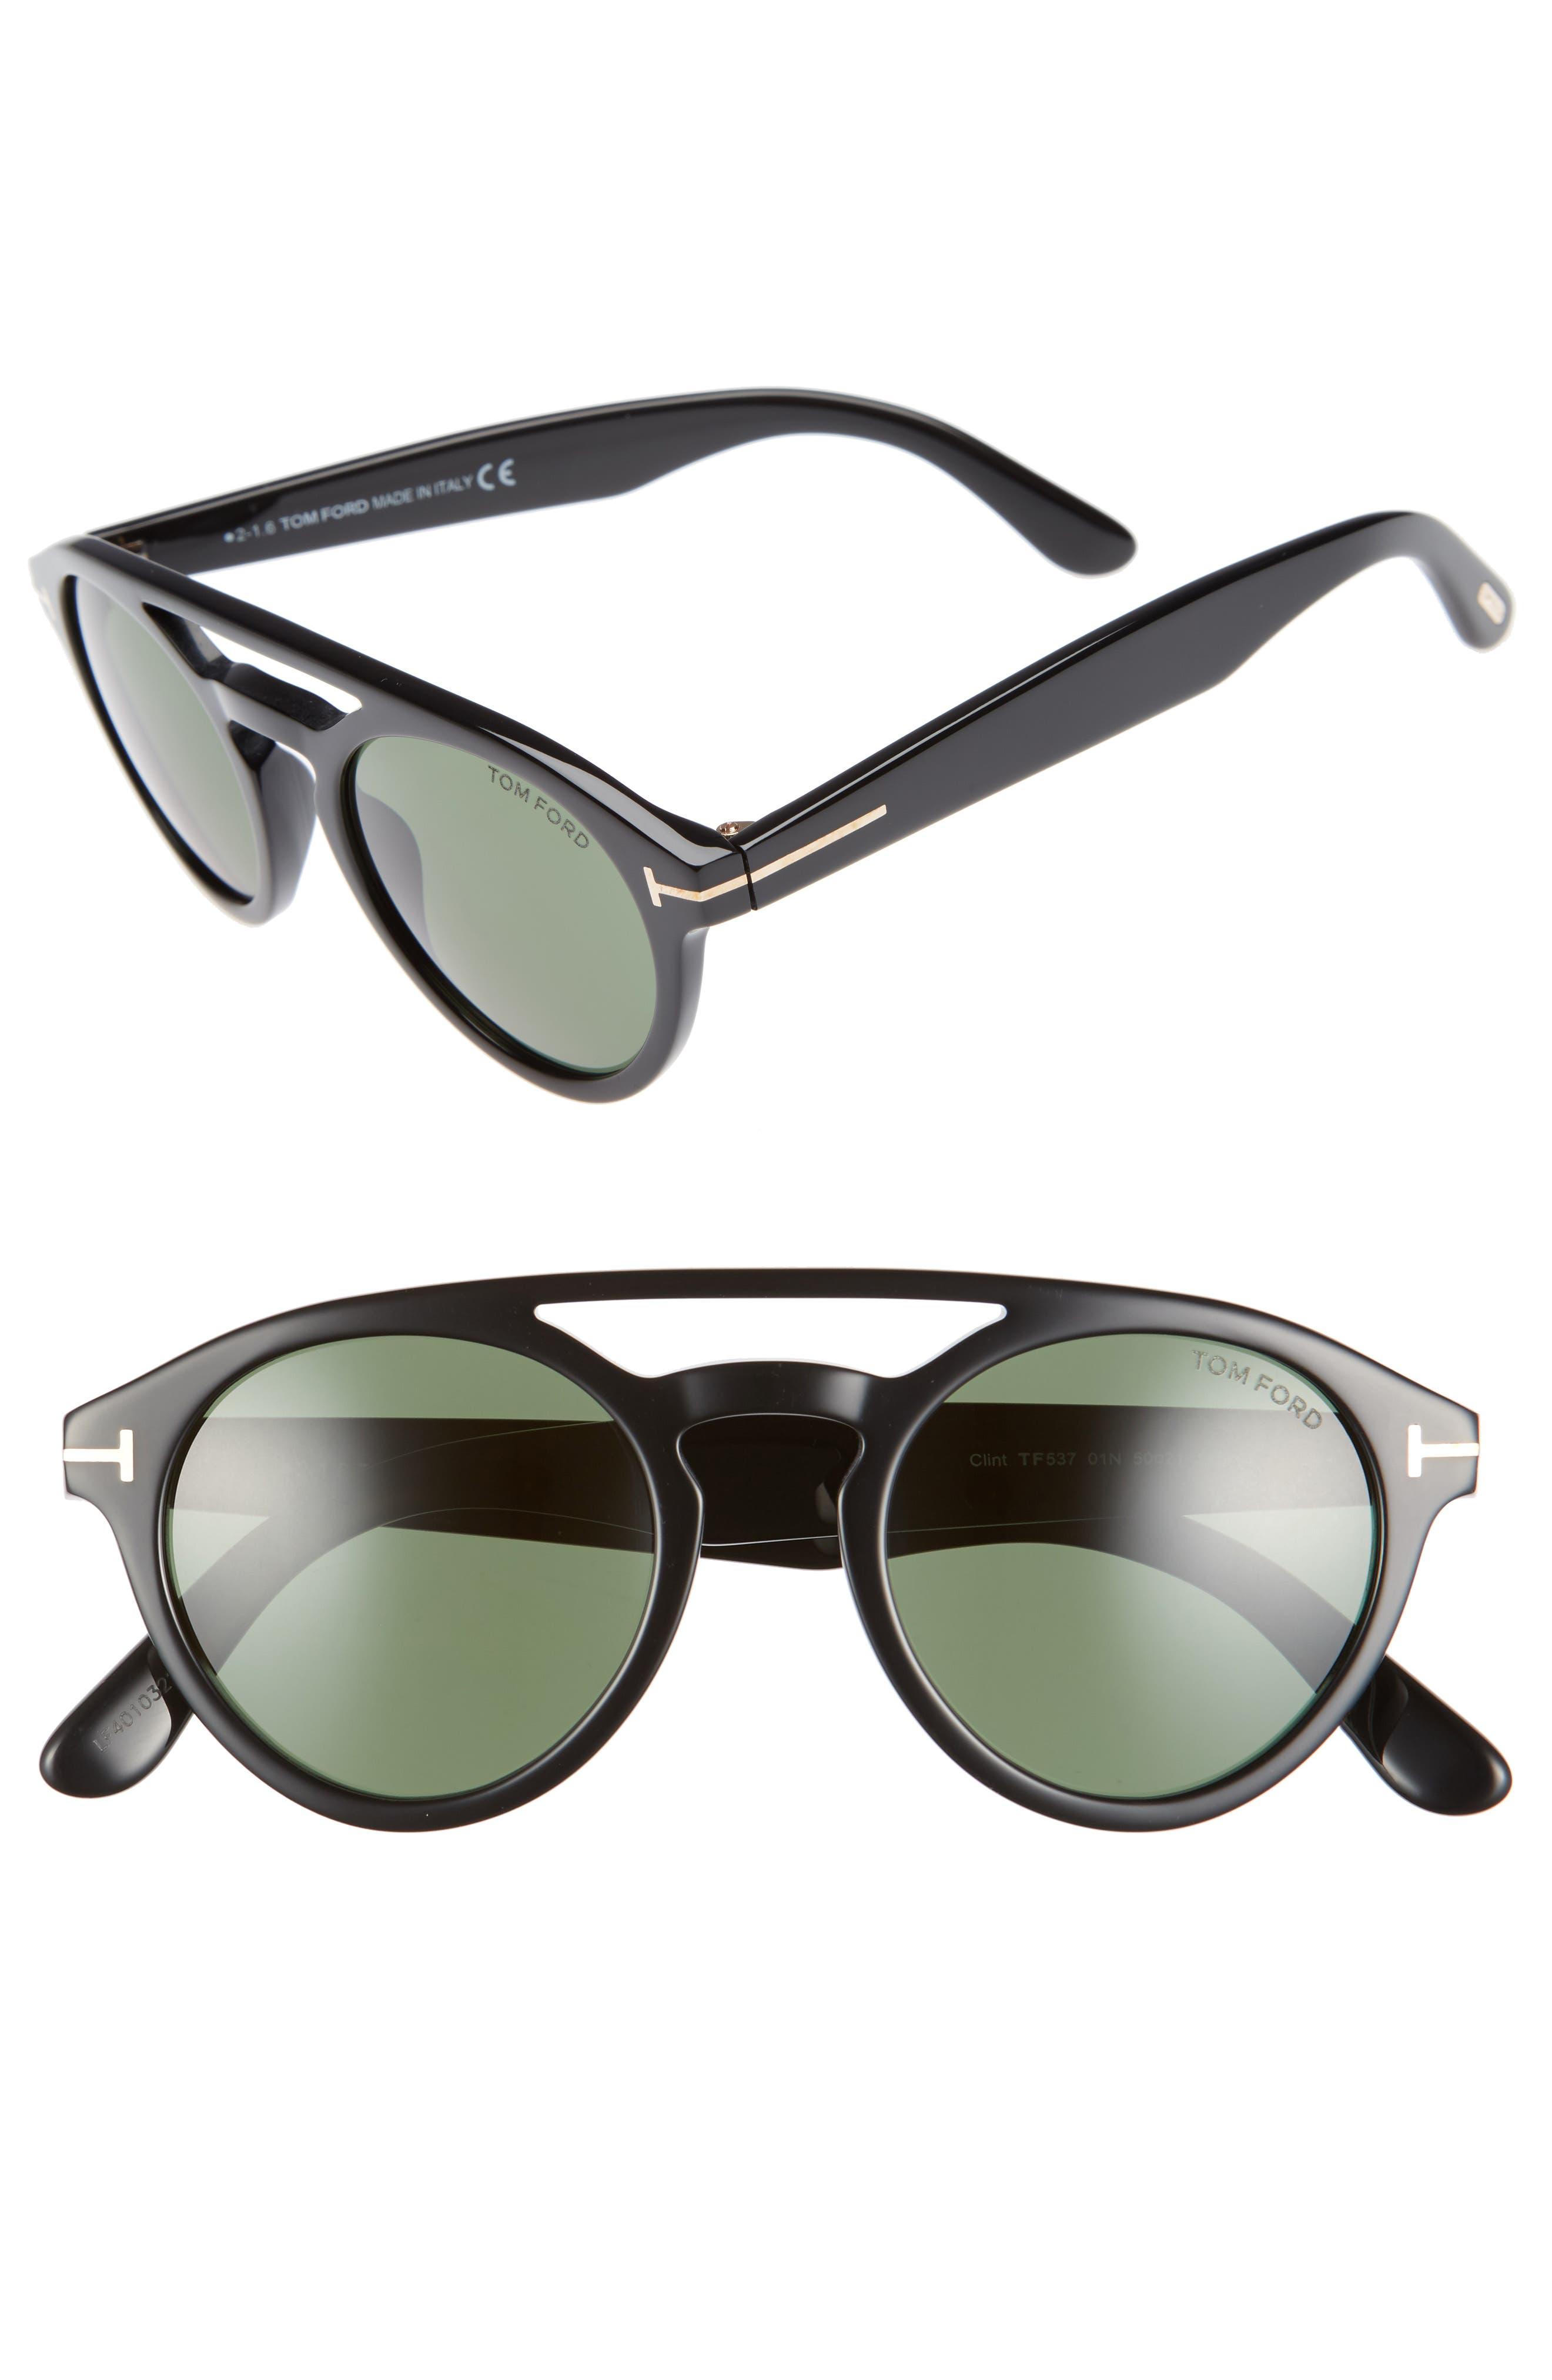 Clint 50mm Aviator Sunglasses,                             Main thumbnail 1, color,                             002